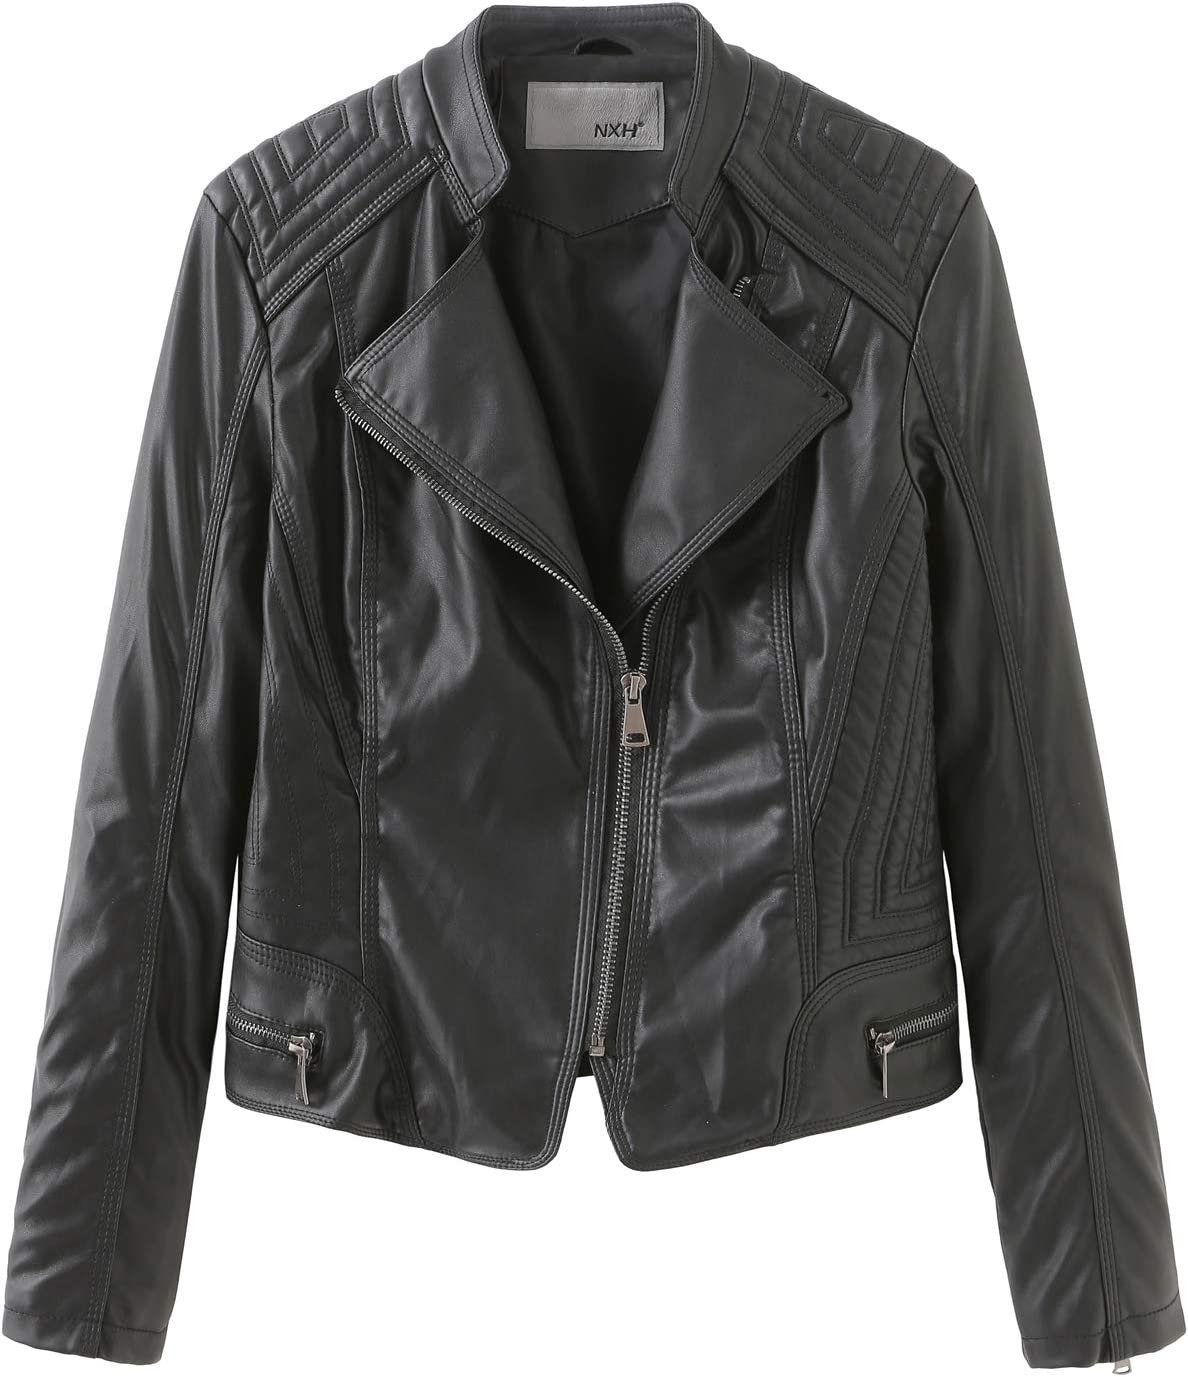 SENDEREAL New Women's Faux Leather Jackets Black Slim Moto Biker Jacket Coat,M